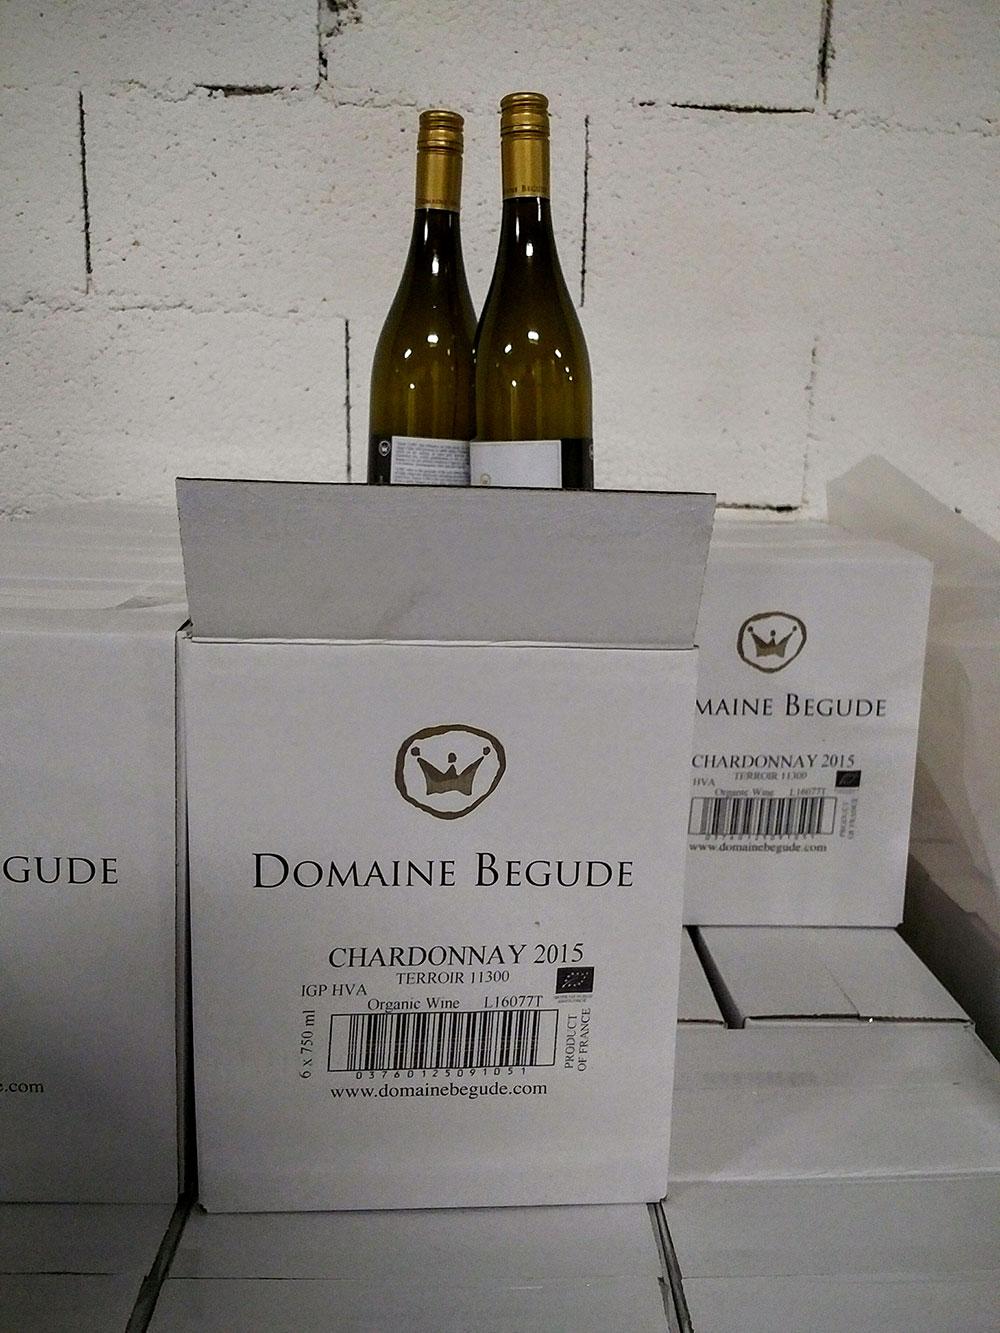 Domaine Bégude's award-winning chardonnay